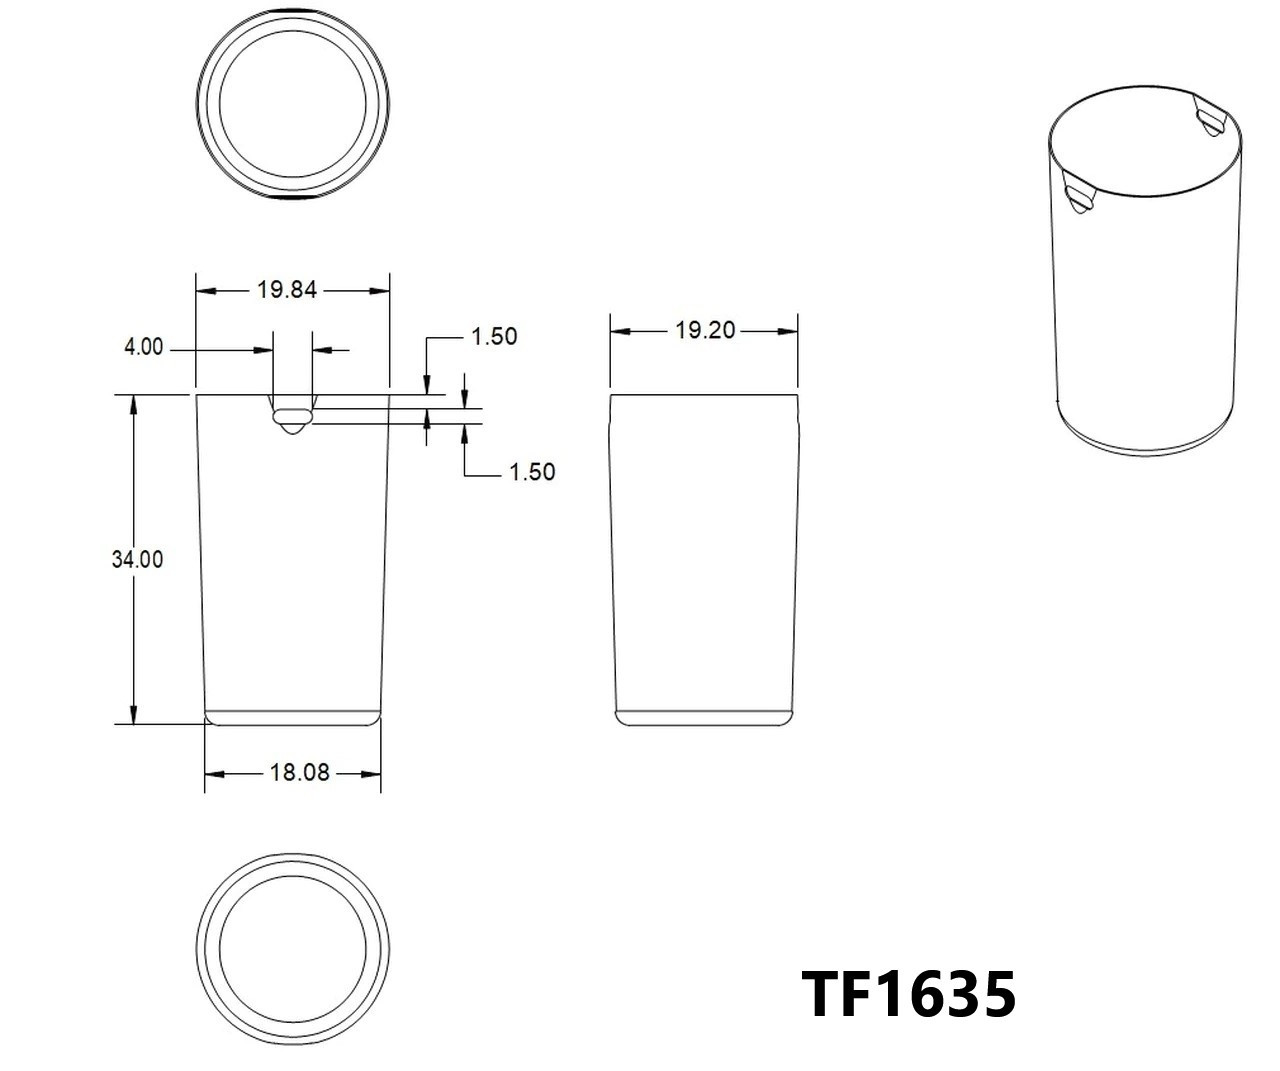 TF1635